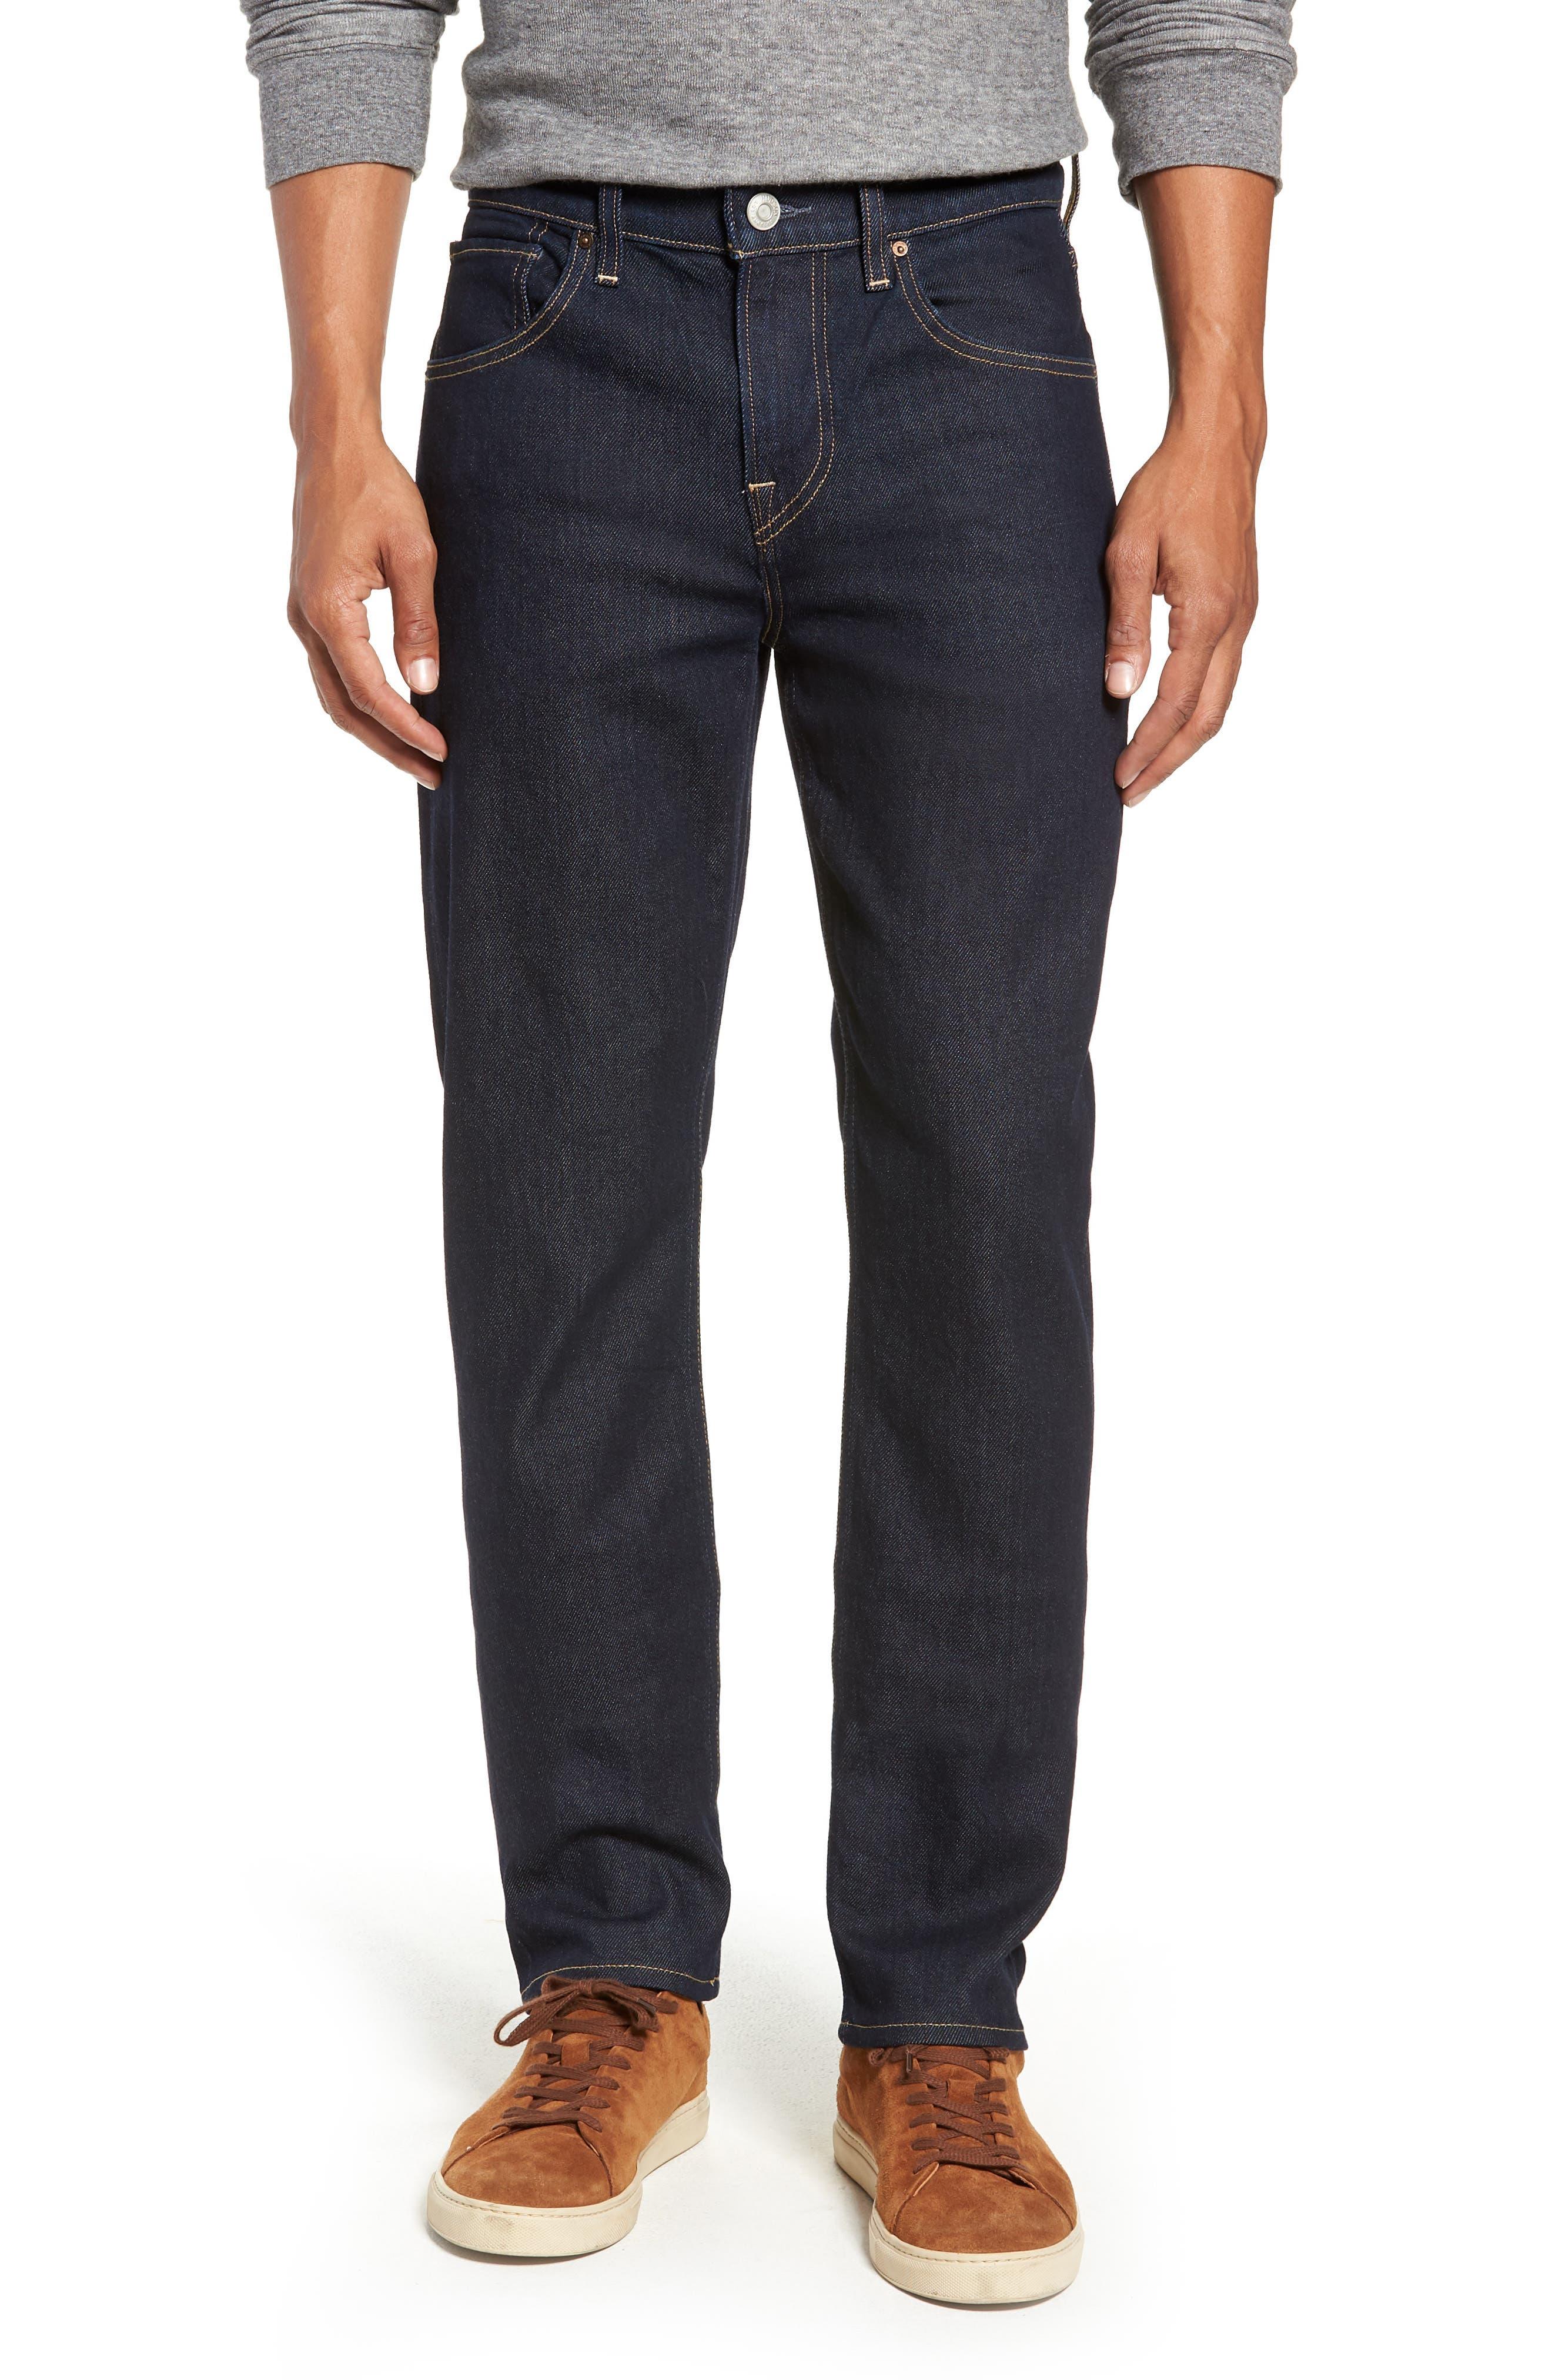 Blake Slim Fit Jeans,                             Main thumbnail 1, color,                             DUARTE